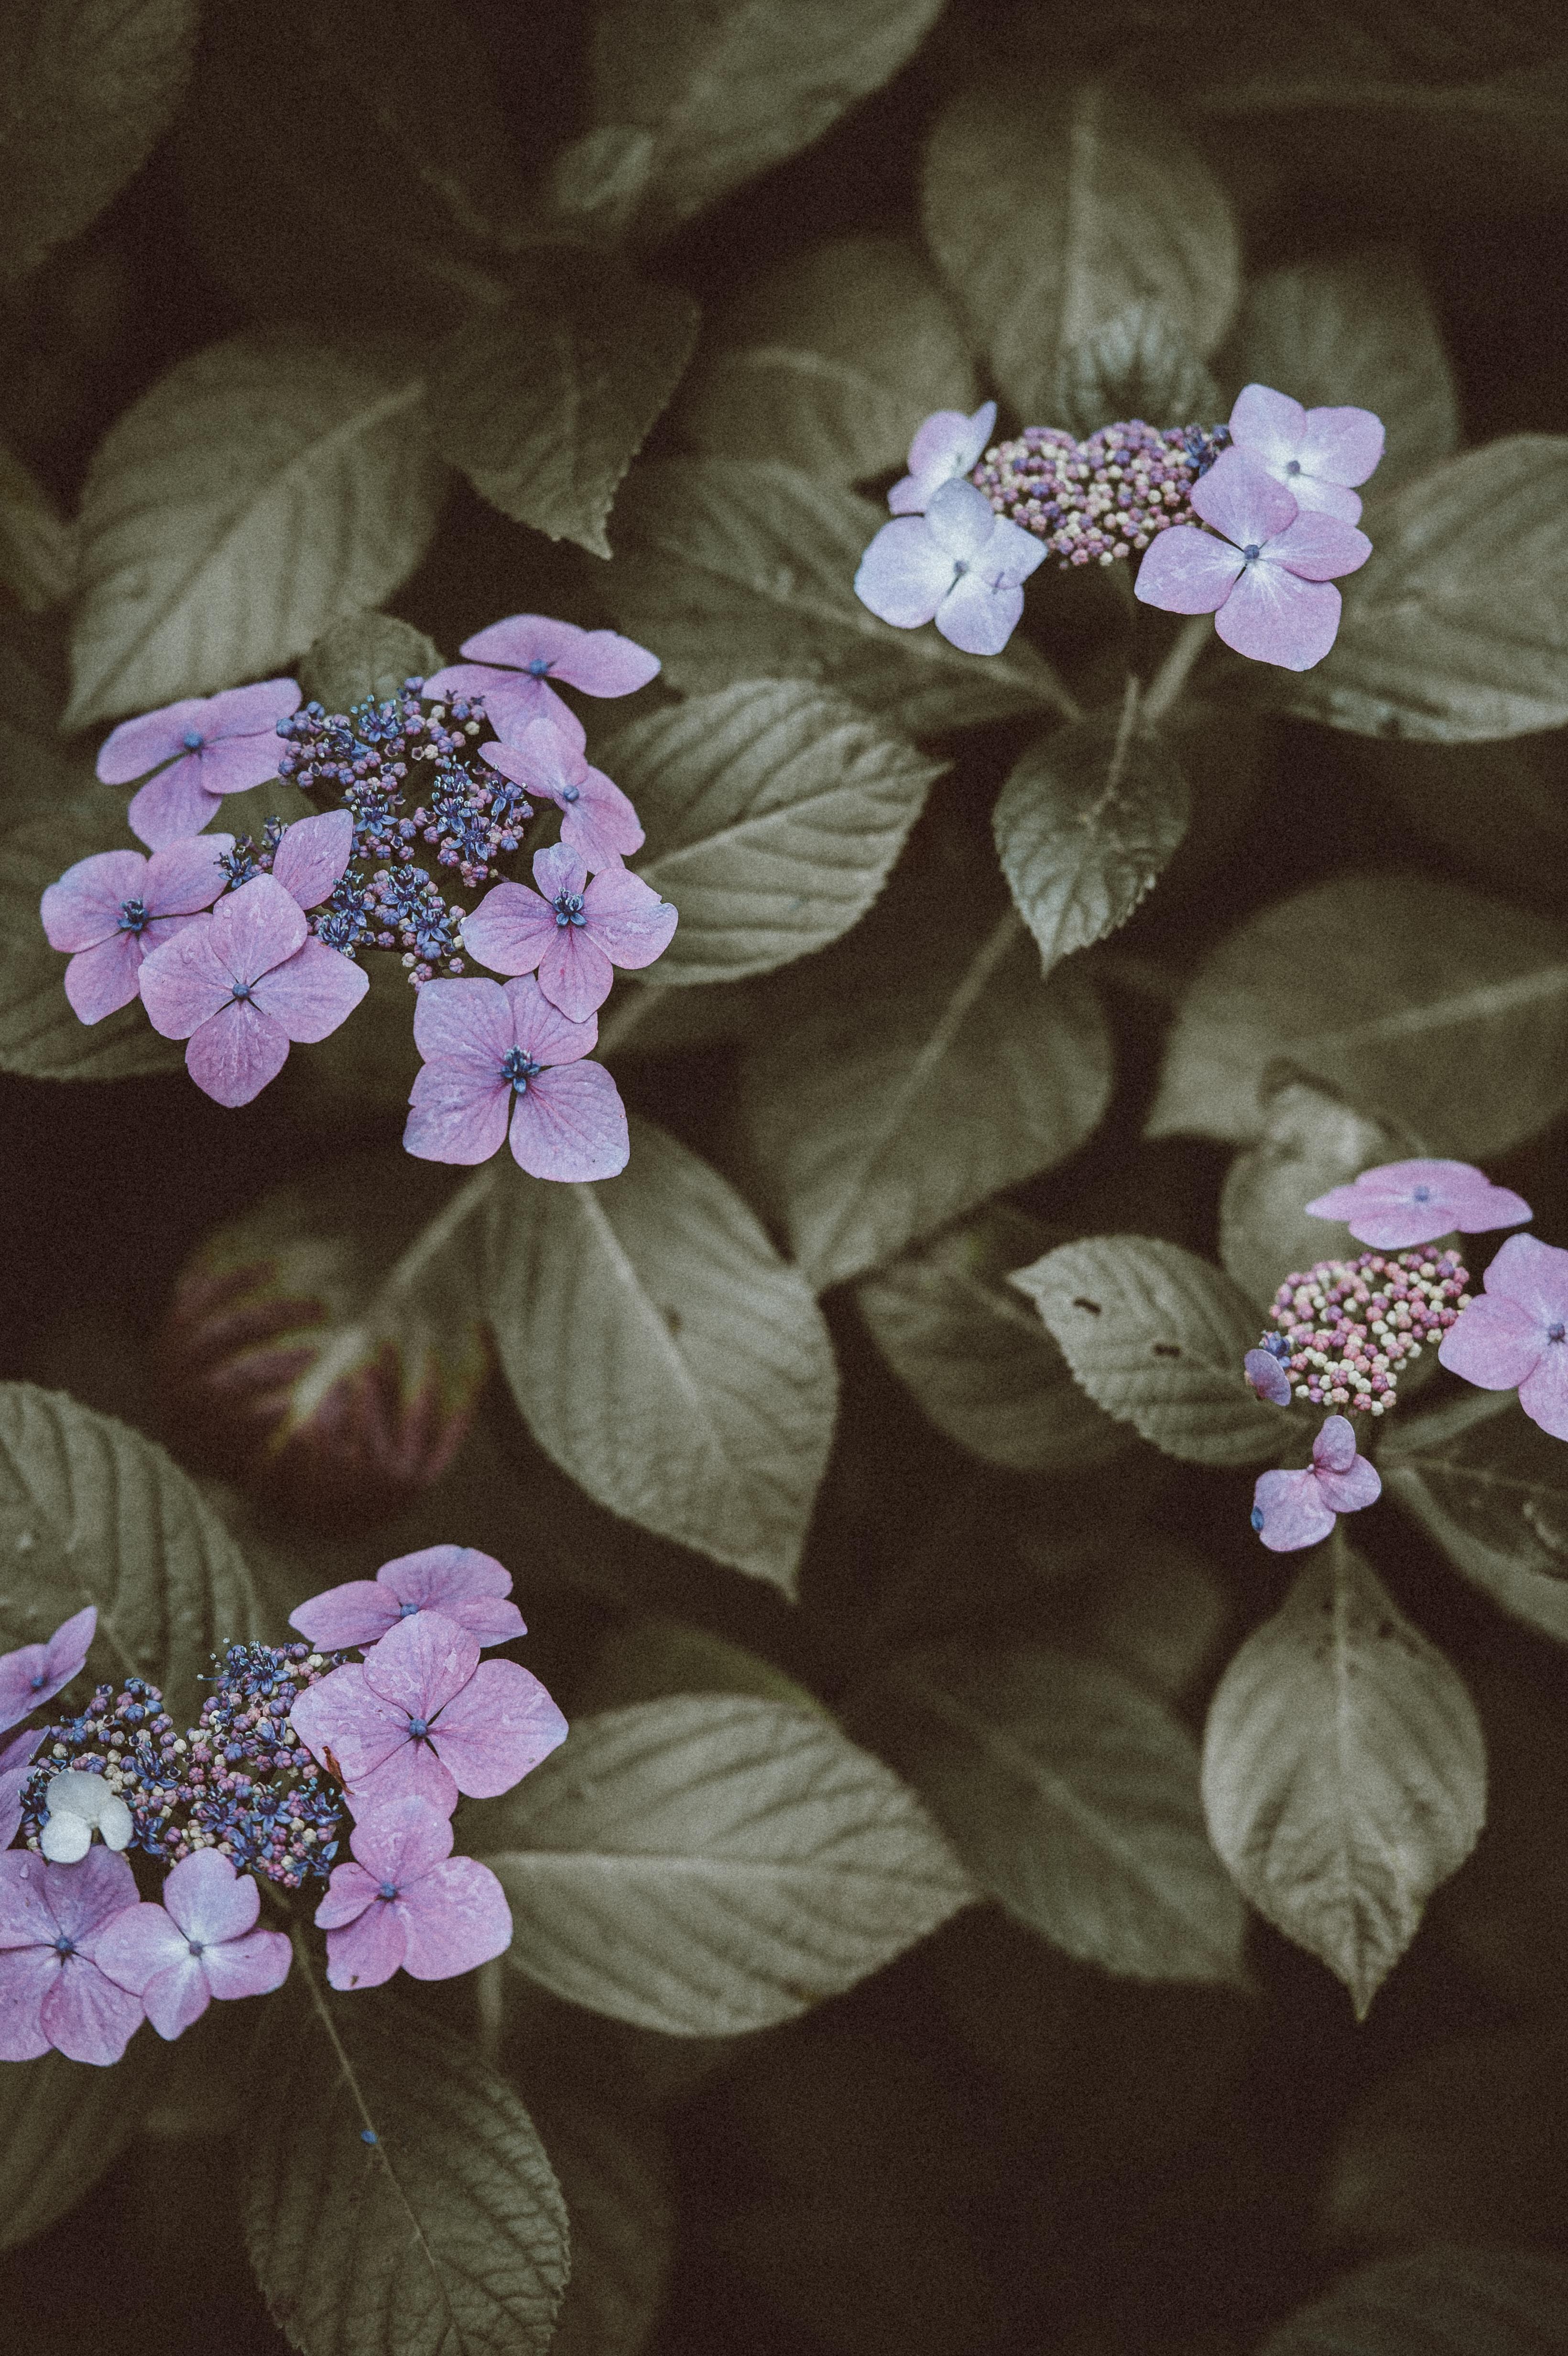 purple petaled flowers close-up photography